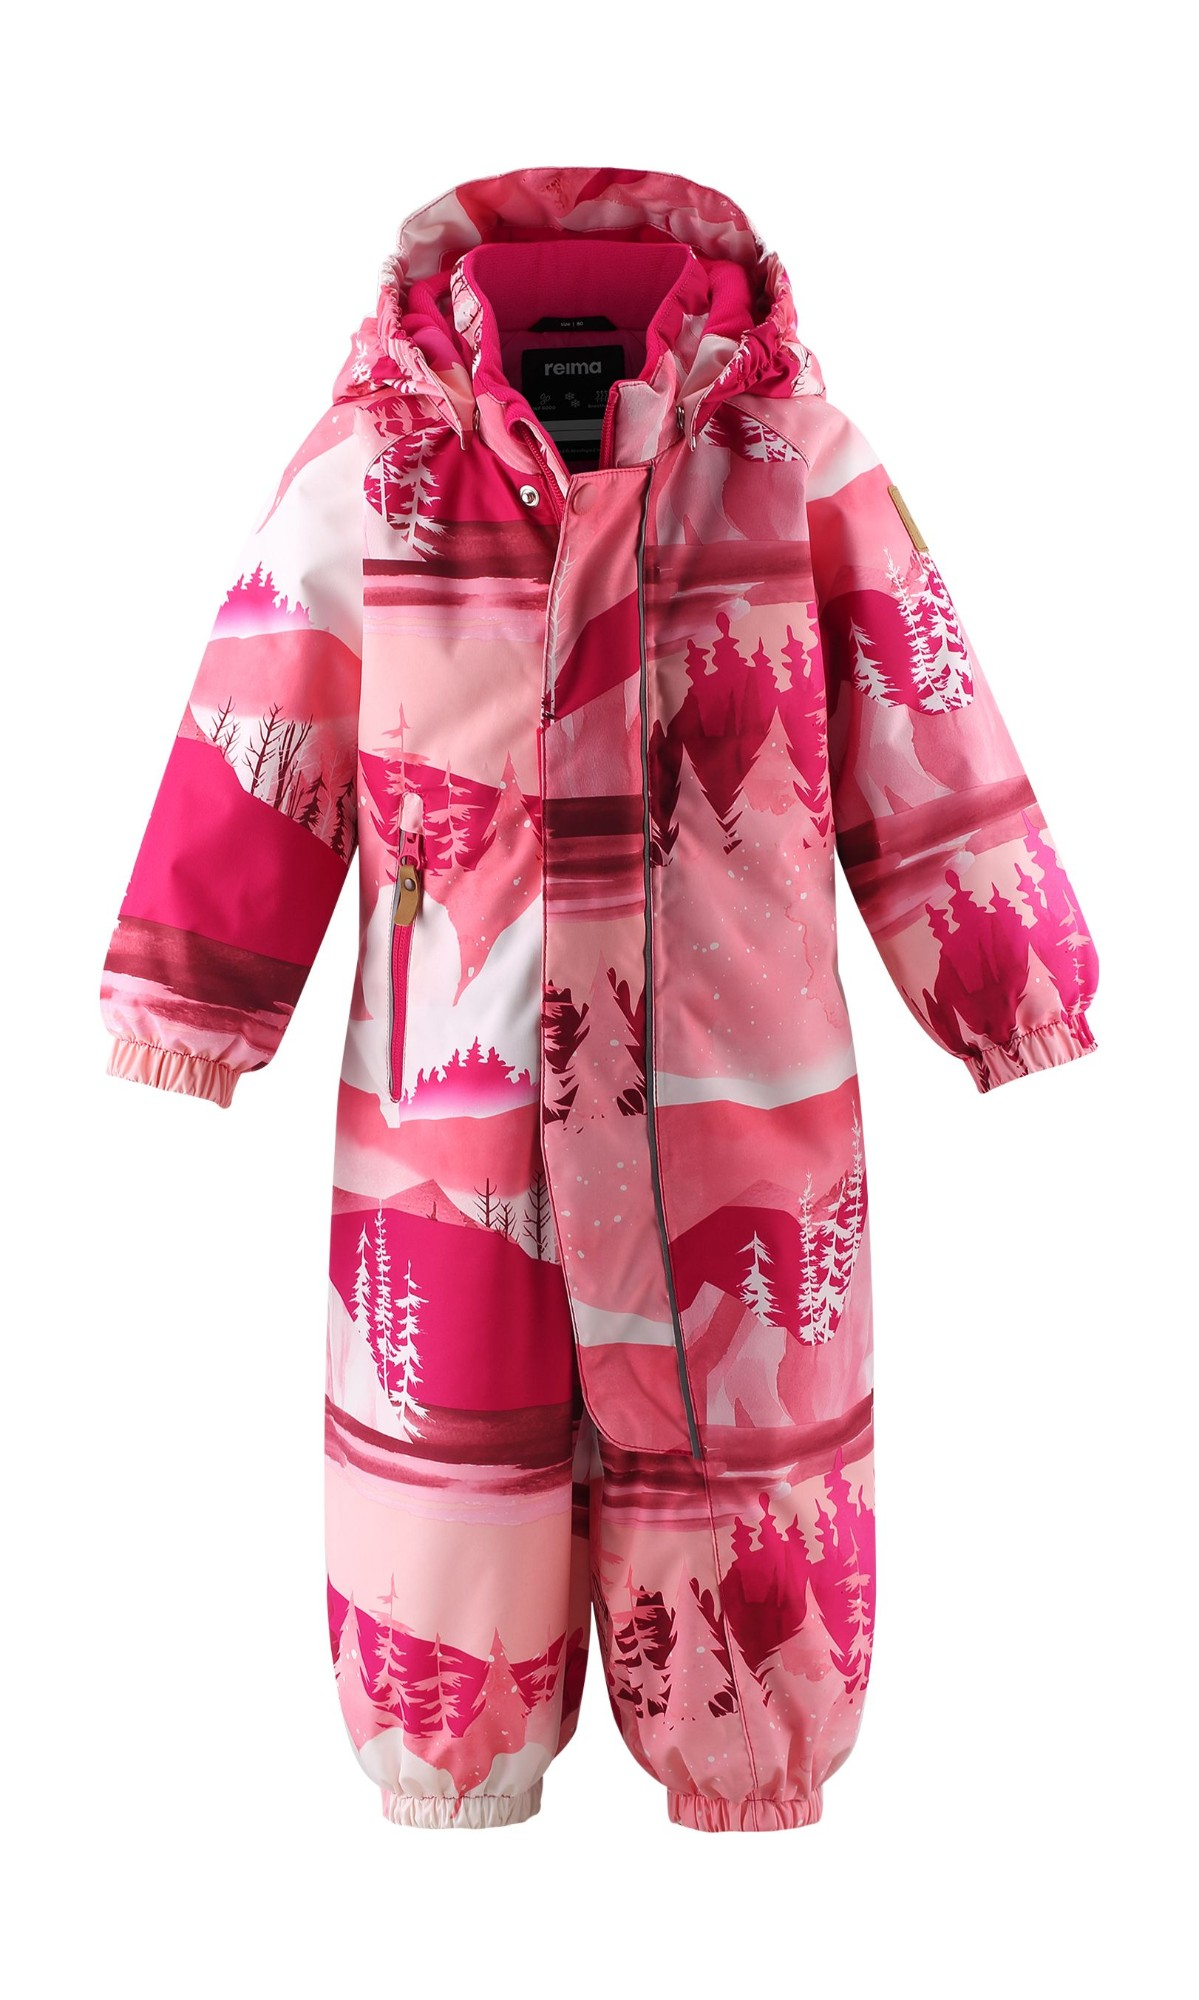 REIMA Puhuri 510306 Raspberry Pink 4655 80